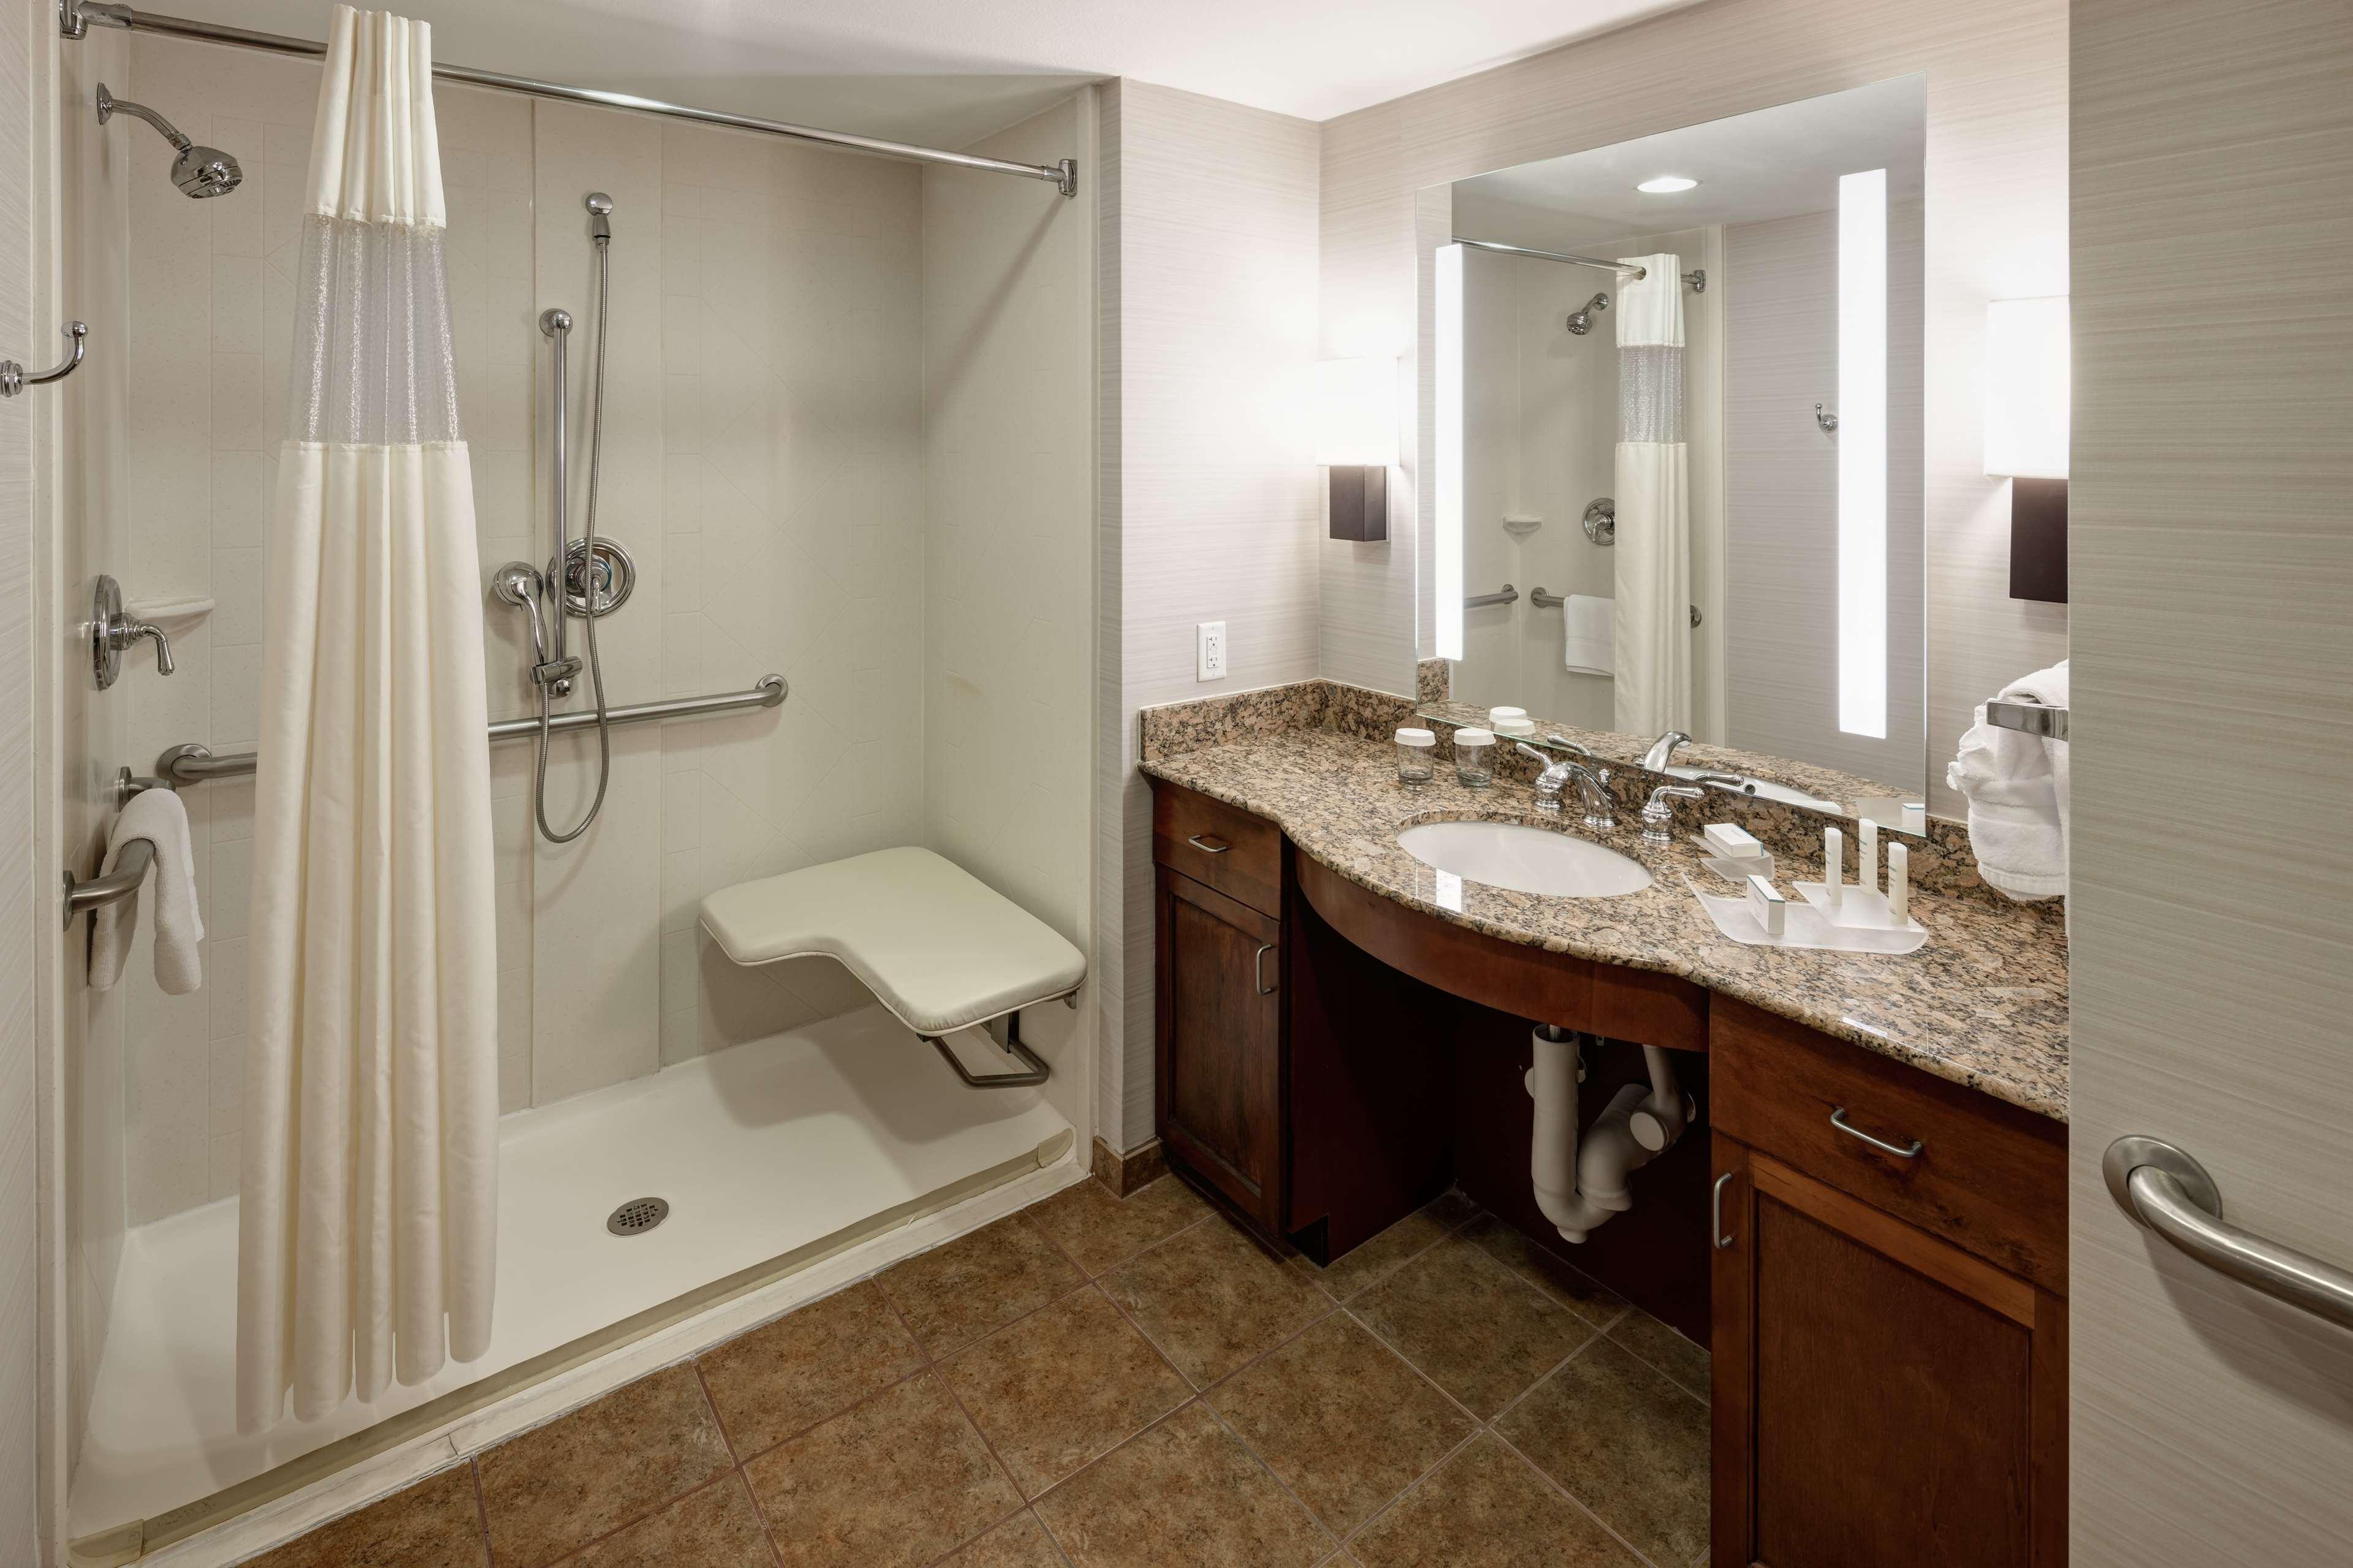 Homewood Suites by Hilton Denton image 21